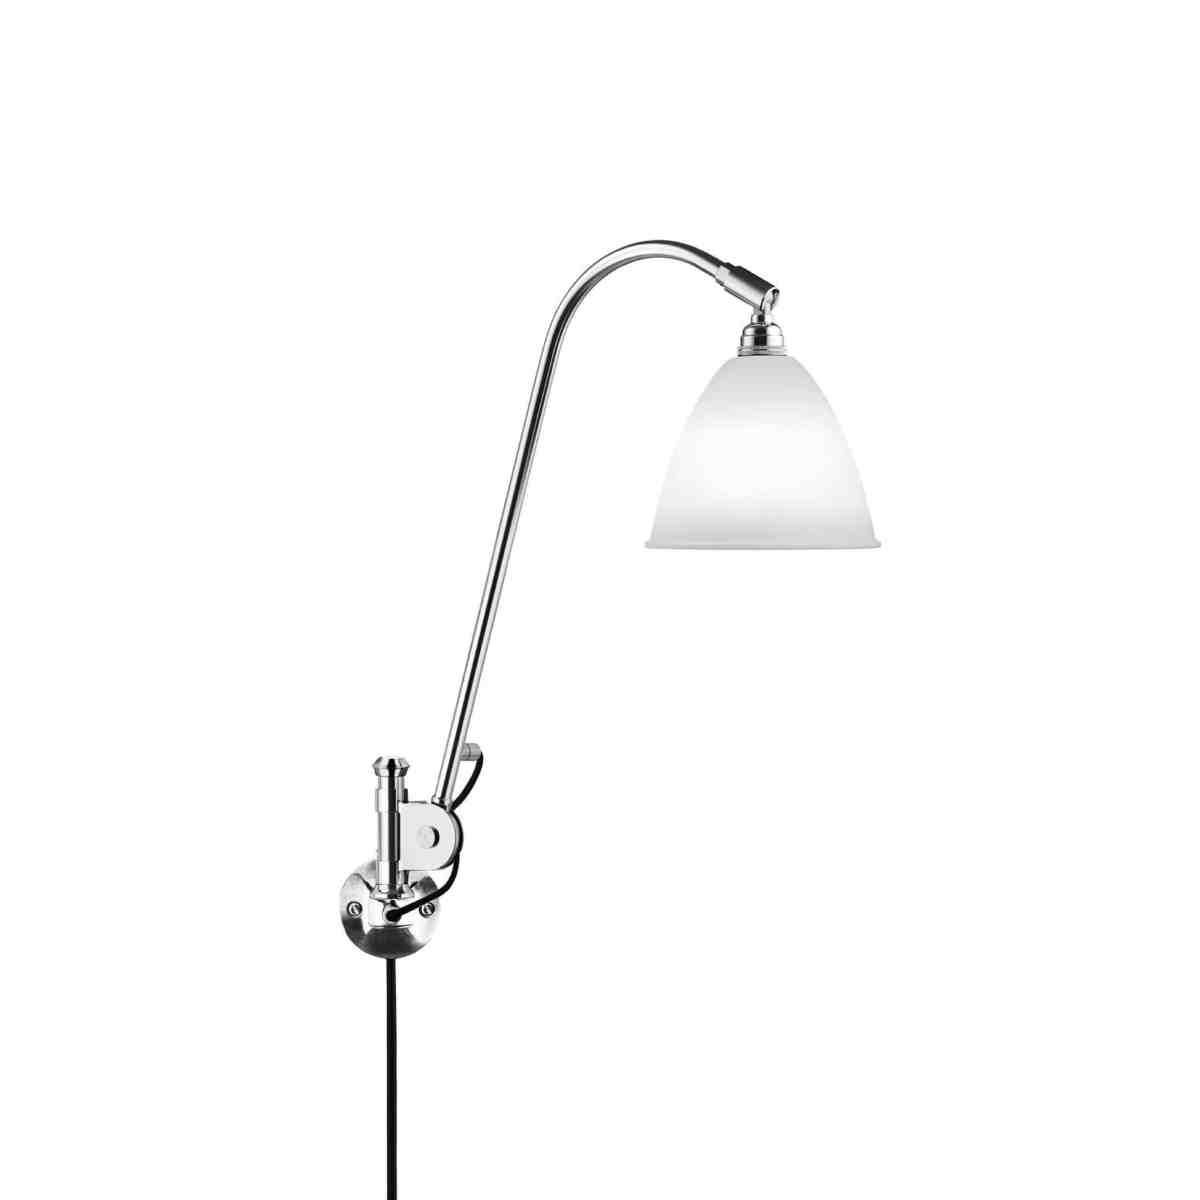 gubi-bestlite-wall-lamp-BL6-translucent-bone-china-porcelain-chrome-01